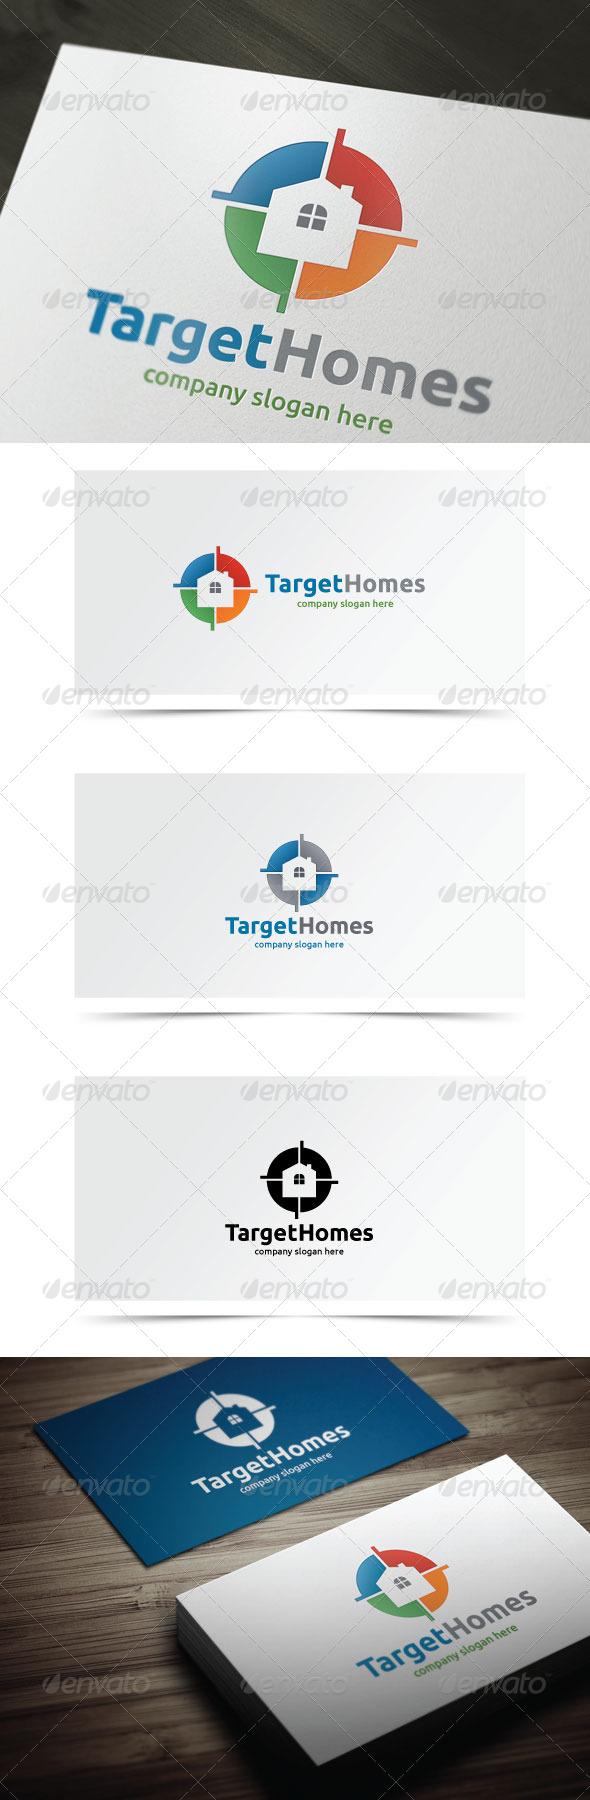 Target Homes